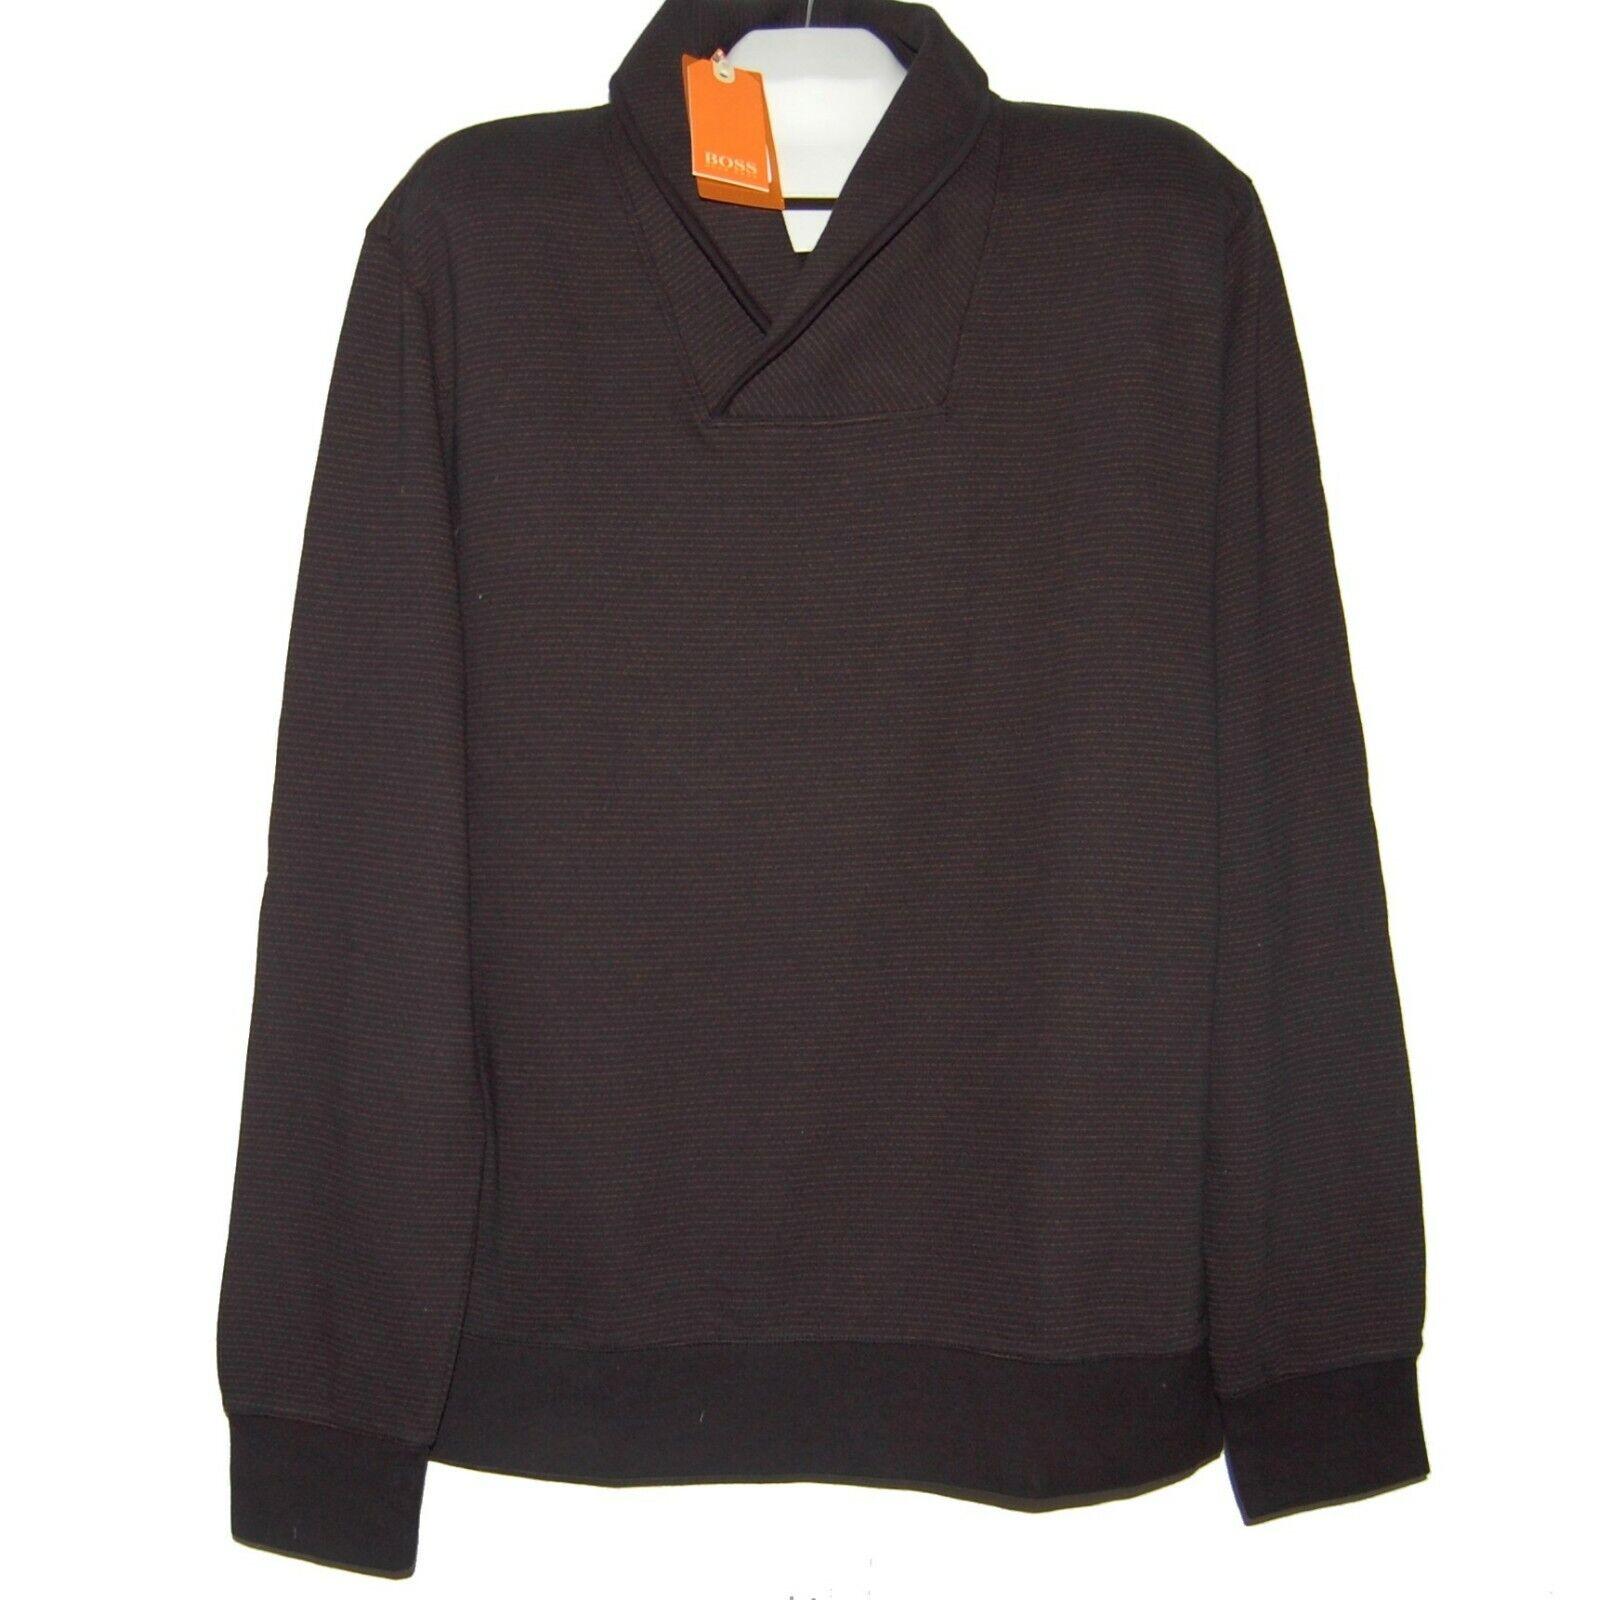 710457248 Hugo Boss Brown Stripes Men's Cotton Sweater Size 2XL NEW Polo Shirt ...